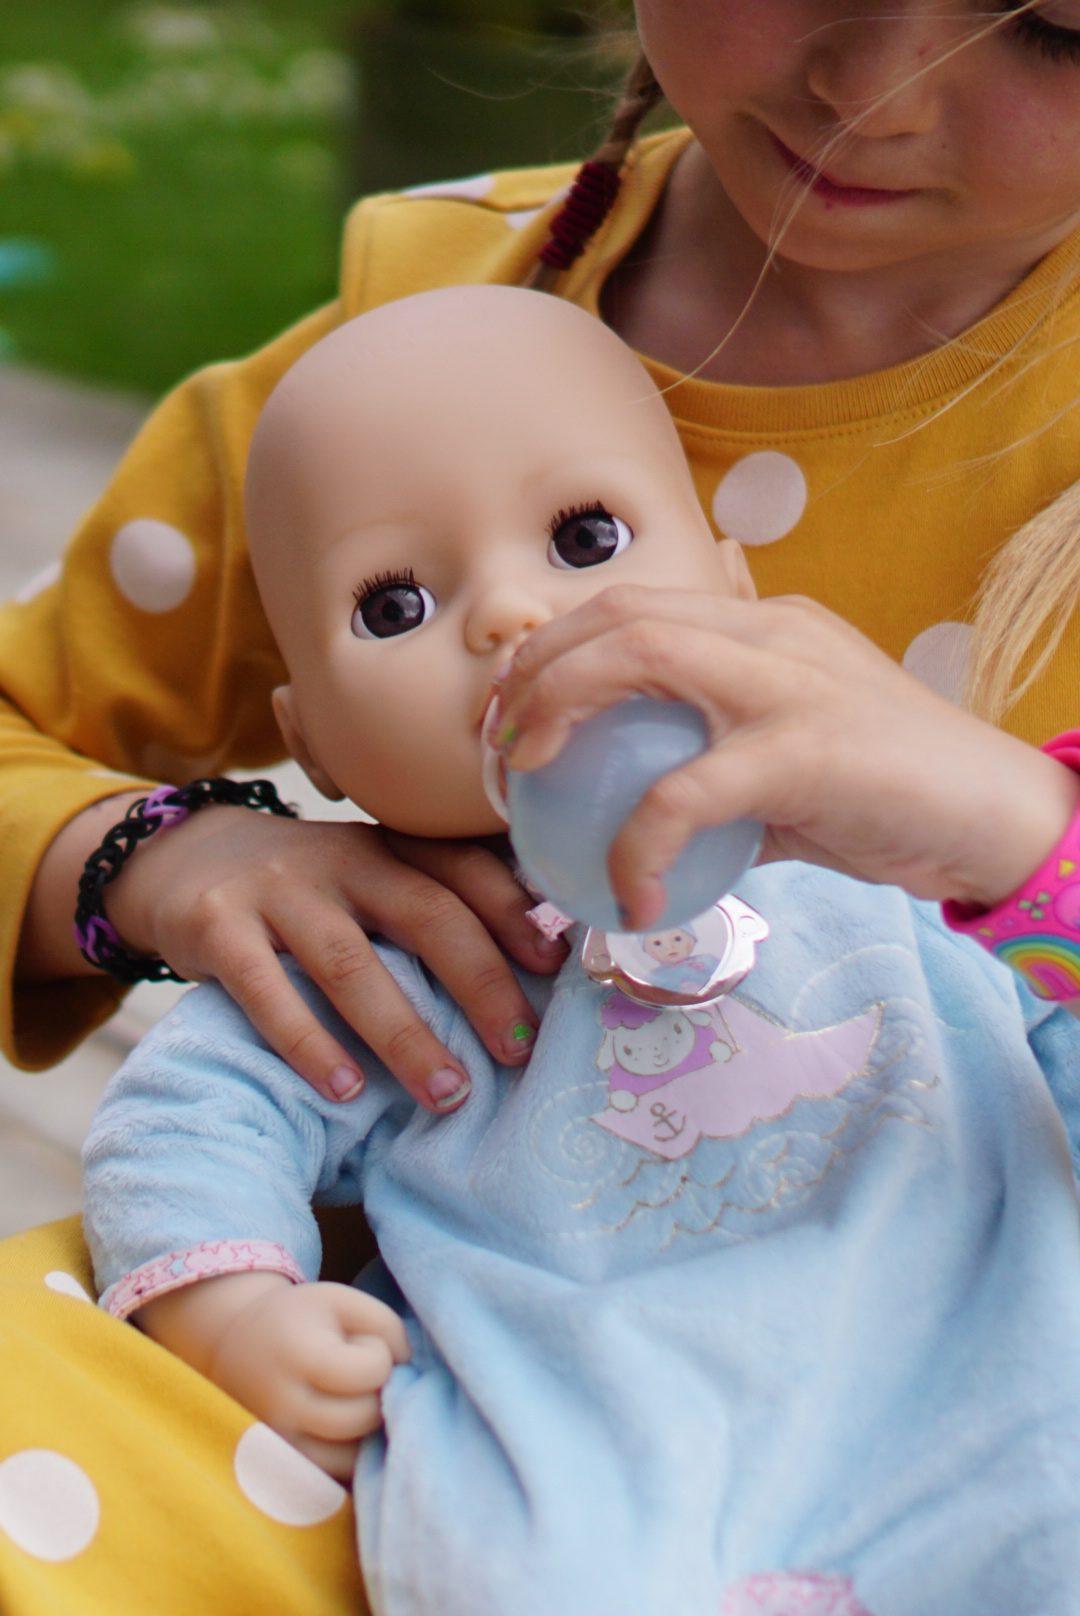 Girl feeding a Baby Alexander doll a bottle